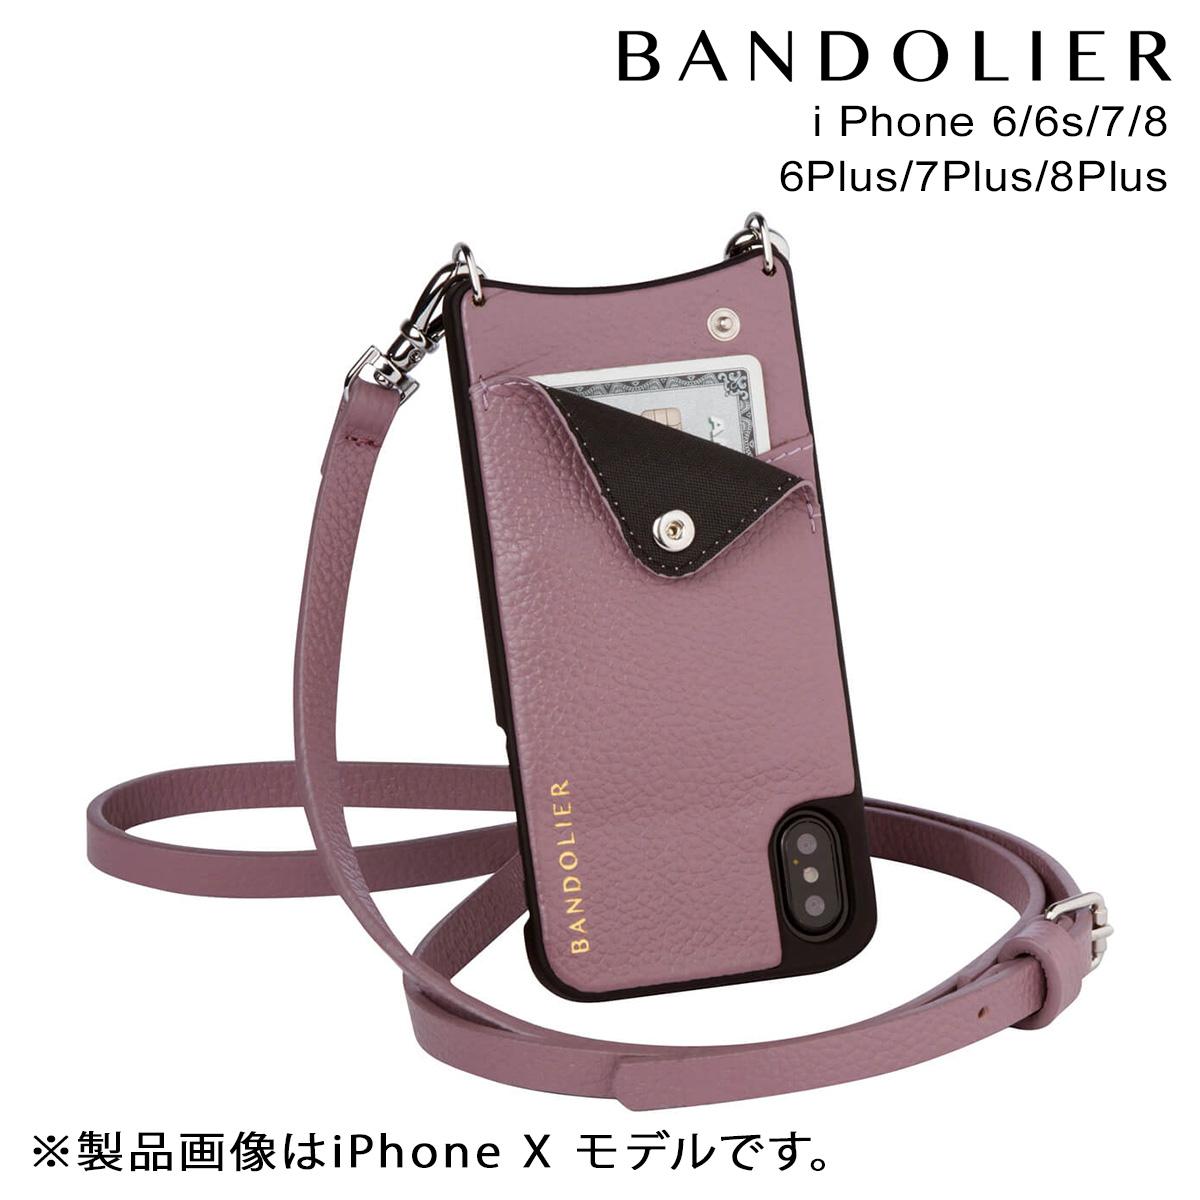 BANDOLIER iPhone8 iPhone7 7Plus 6s EMMA IRIS バンドリヤー ケース スマホ アイフォン プラス メンズ レディース